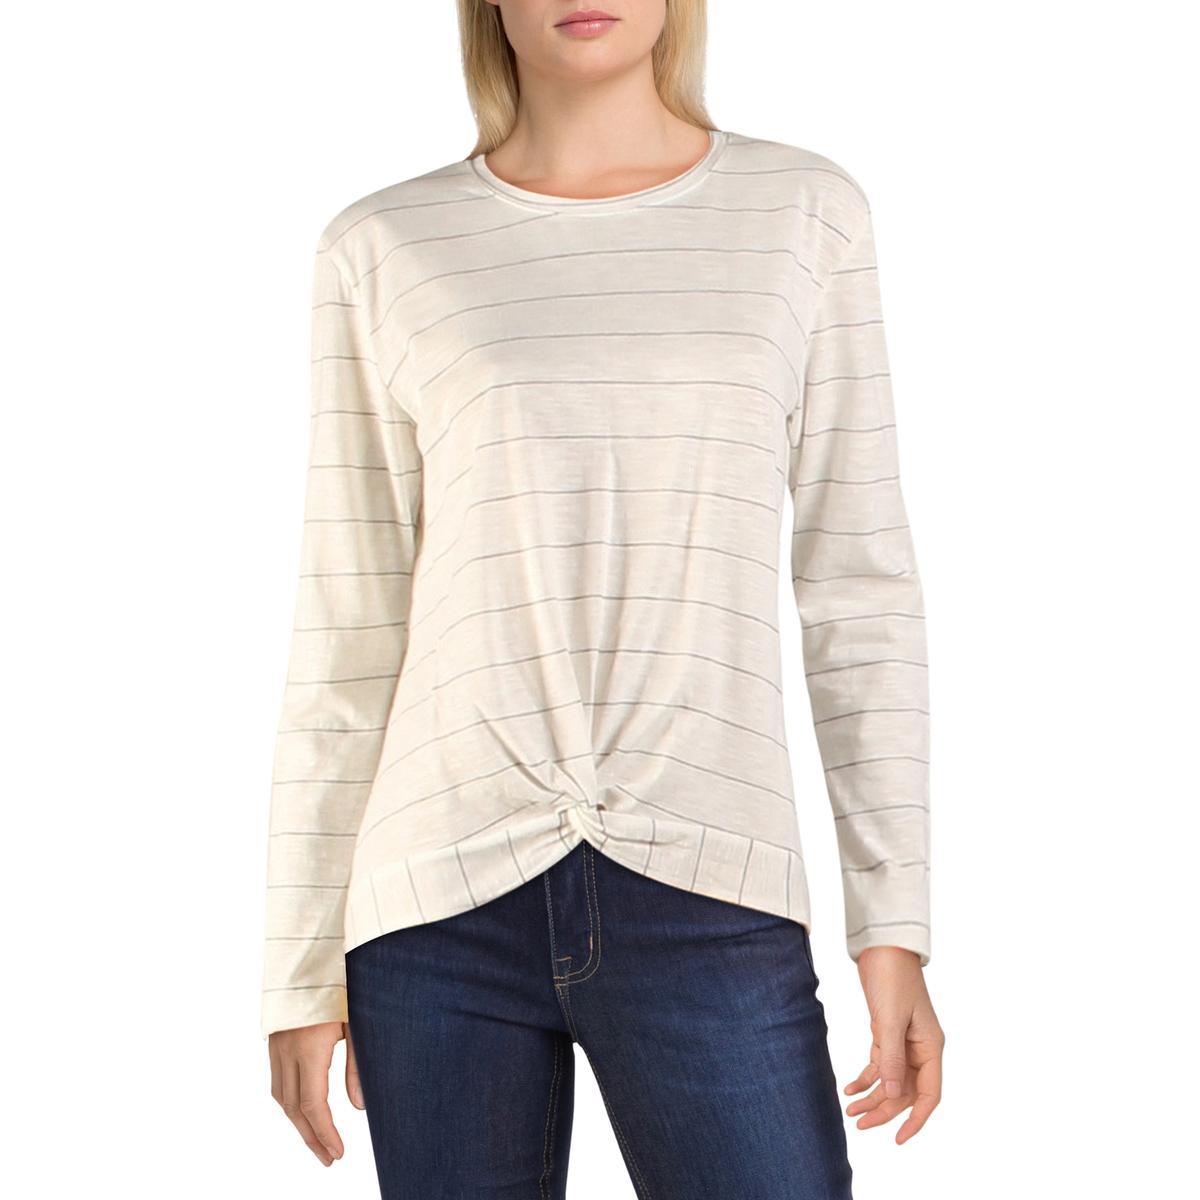 Dex Womens Pinstripe Twist Front Long Sleeves Pullover Top Shirt BHFO 0806